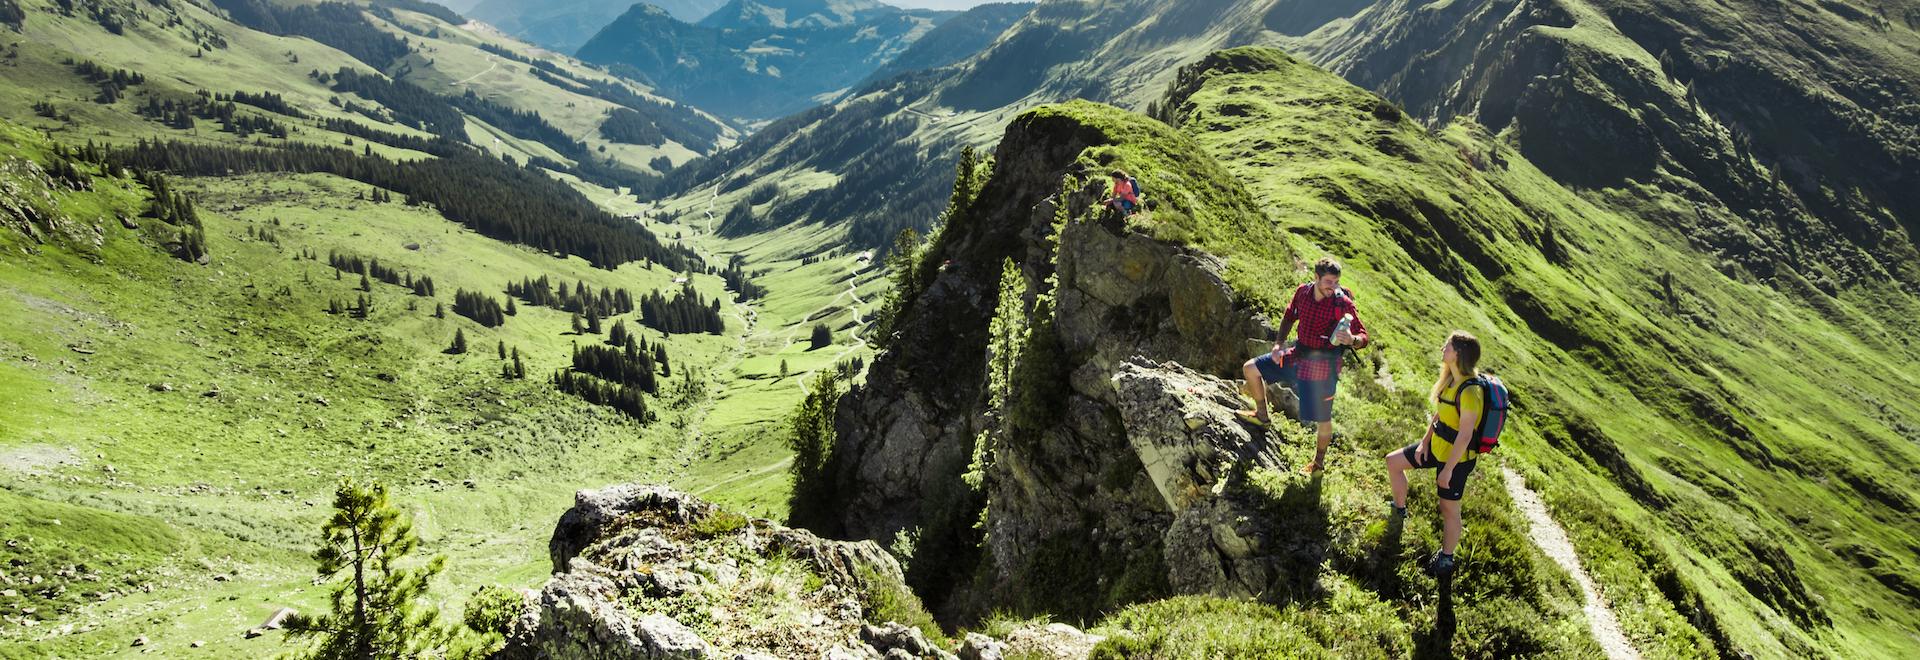 Wandern/Hiking in Saalbach Hinterglemm